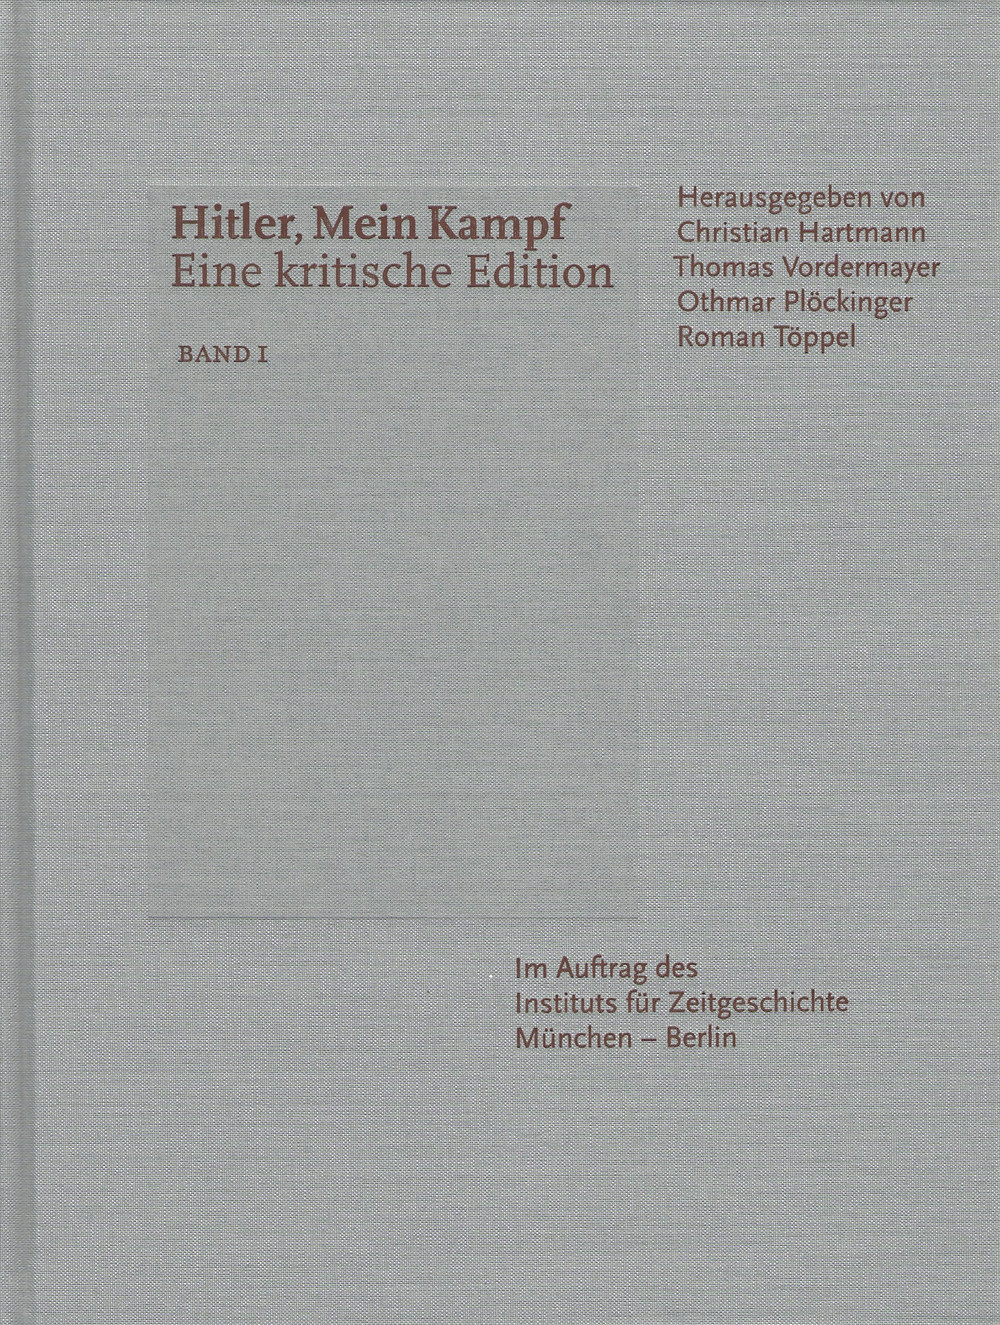 MeinKampf_CriticalEdition_Cover_02